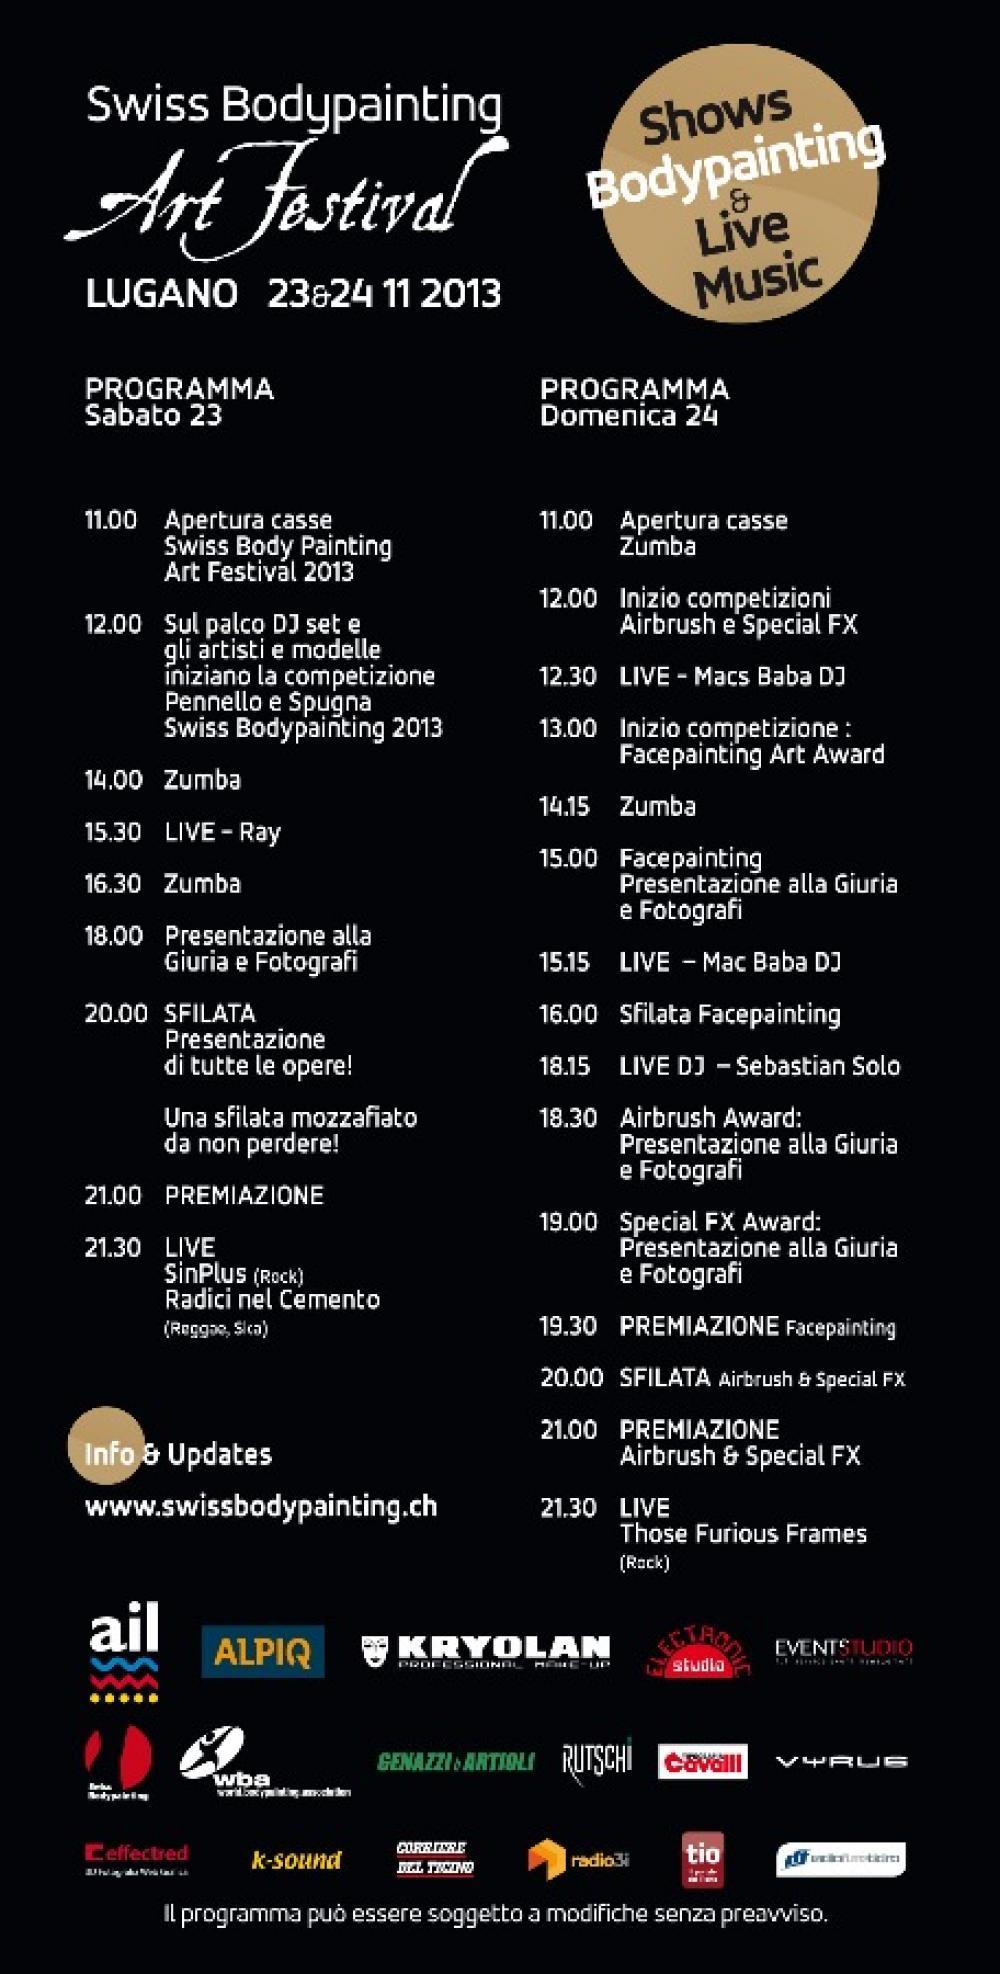 Il programma del Swiss Bodypainting Art Festival 2013